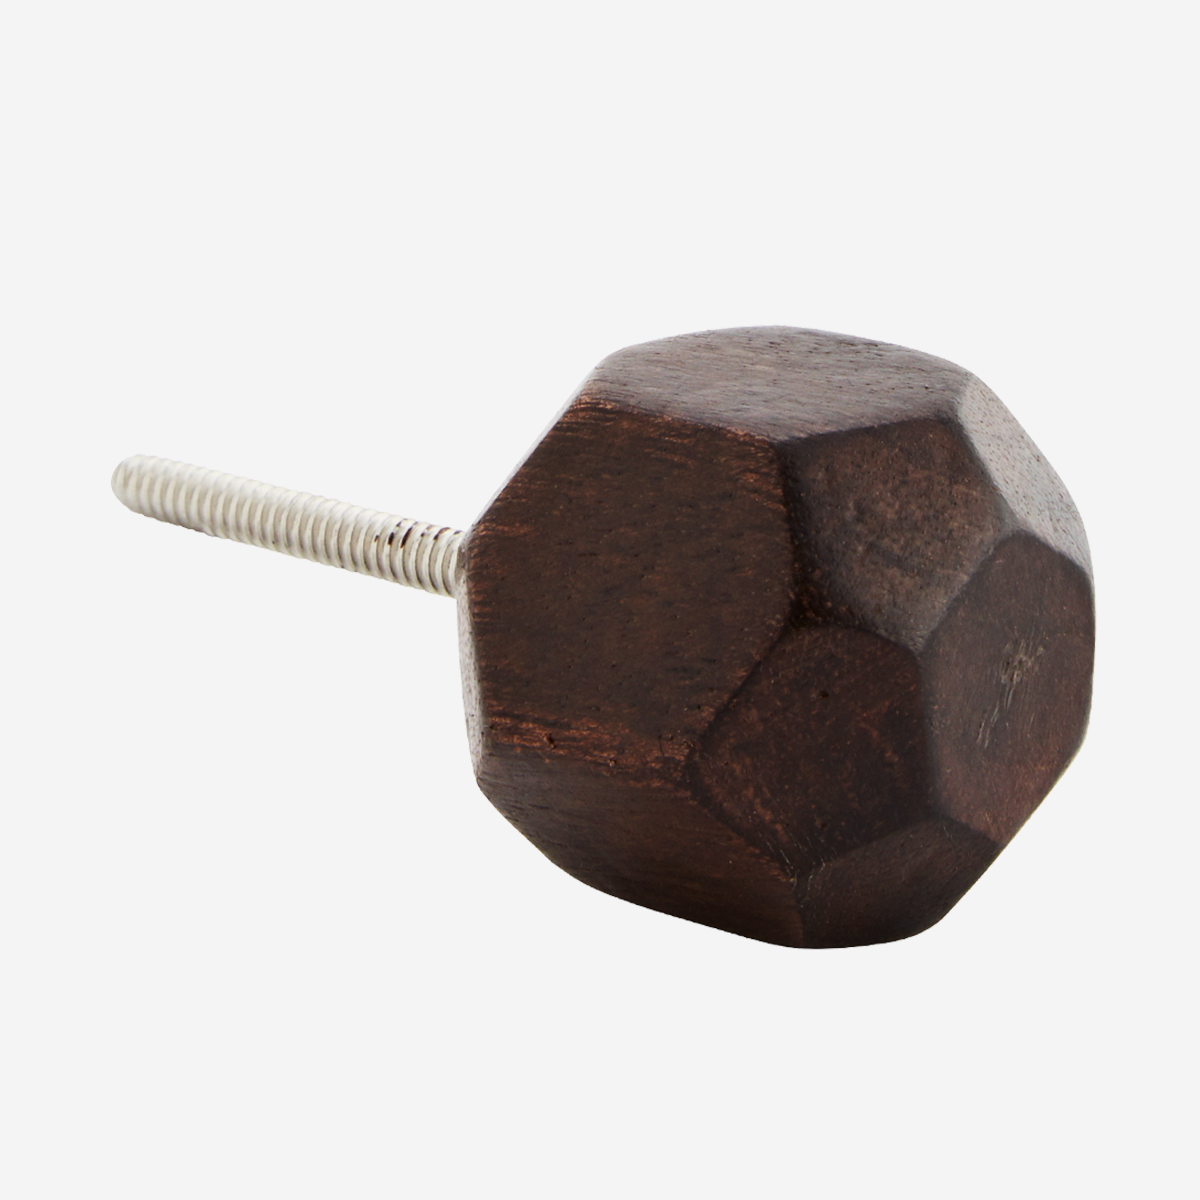 Knopp Ø 35 cm – Natur/trä